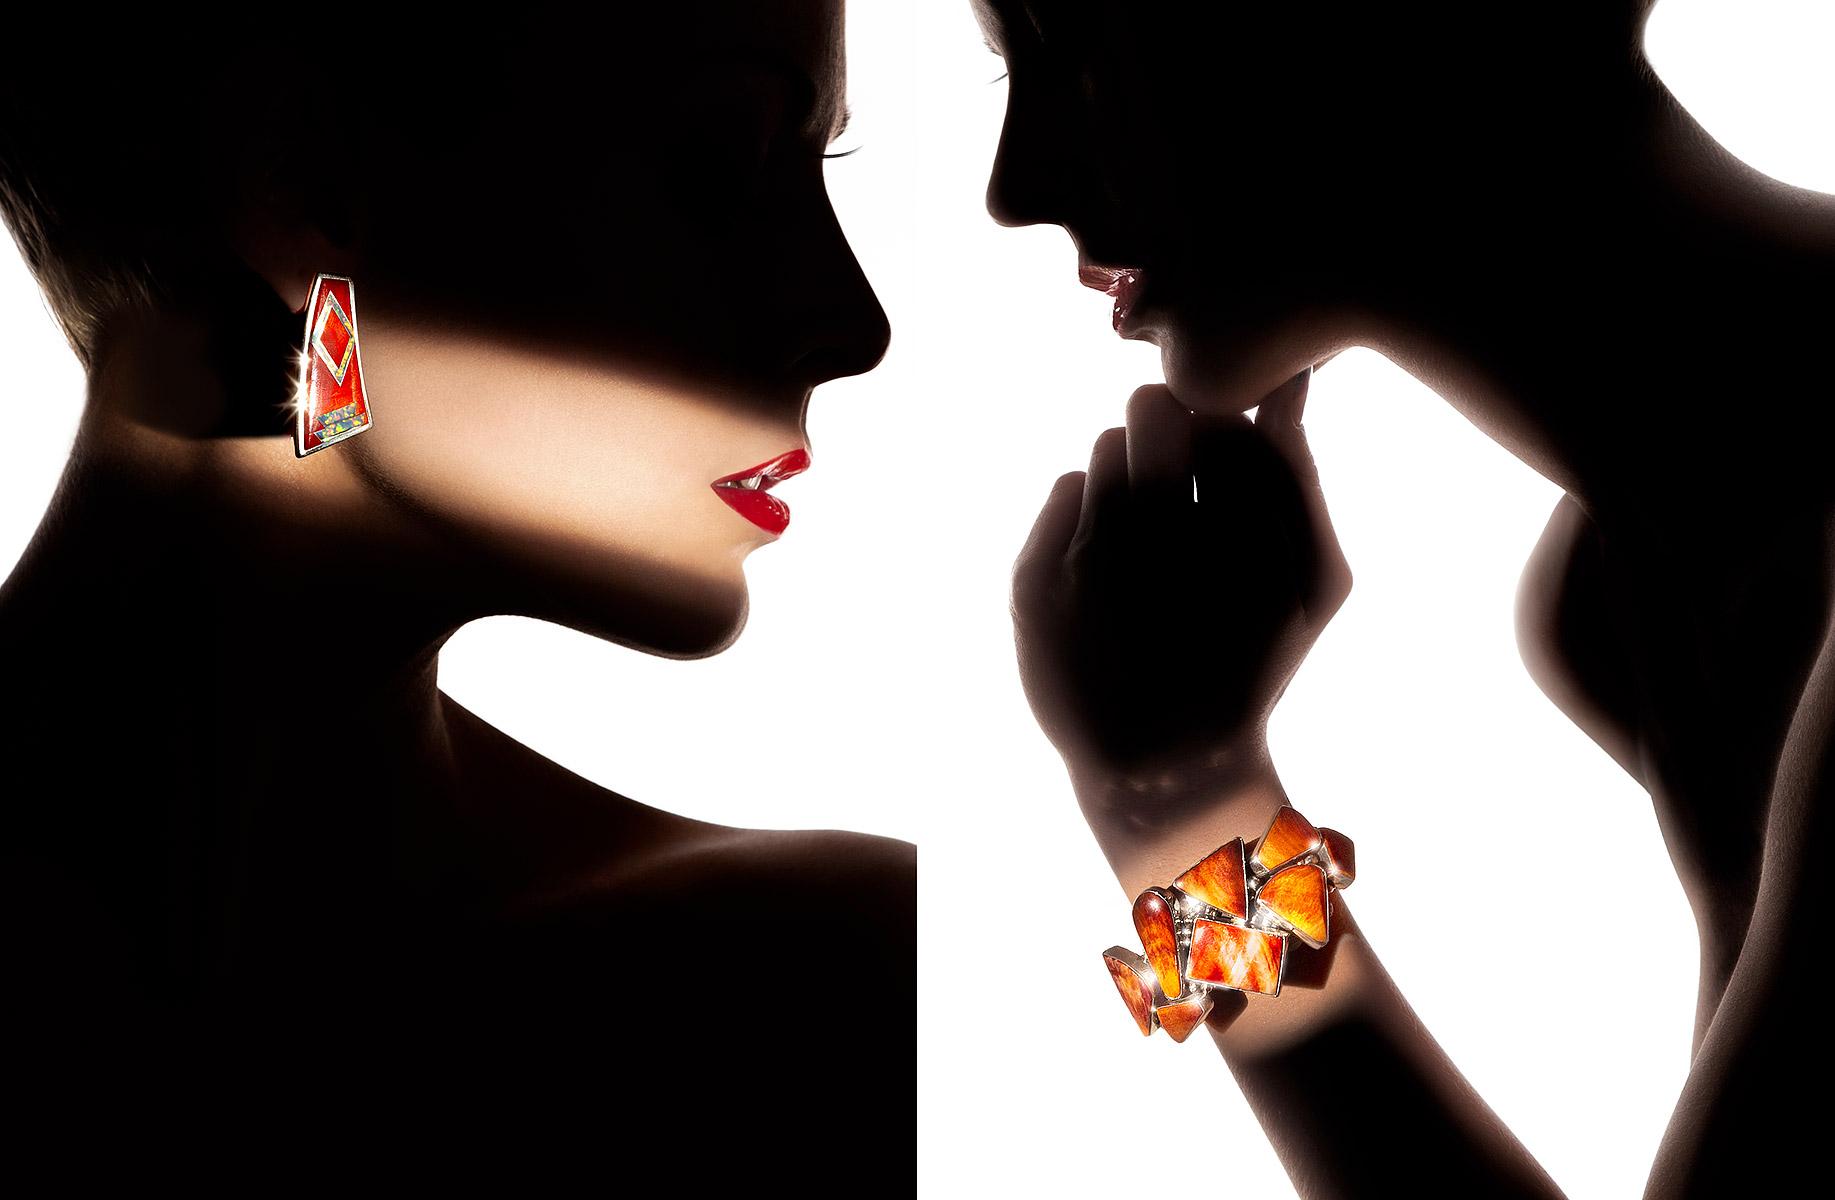 albuquerque-santa-fe-fashion-jewelery-photo-28.jpg